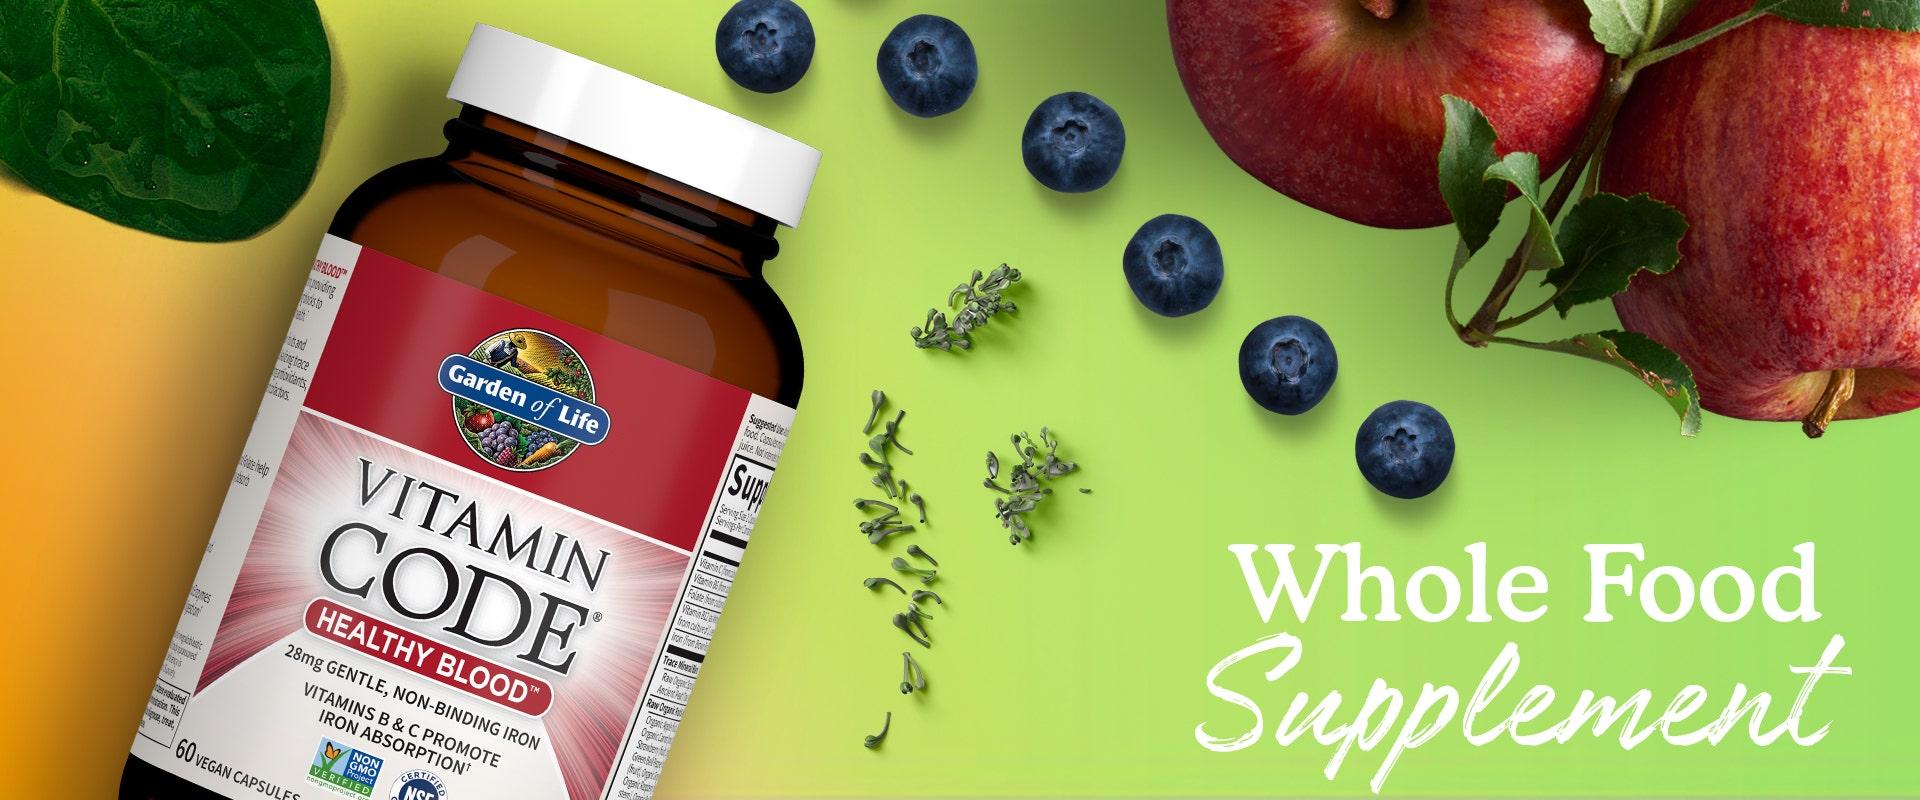 healthy blood vitamin by garden of life vitamin code